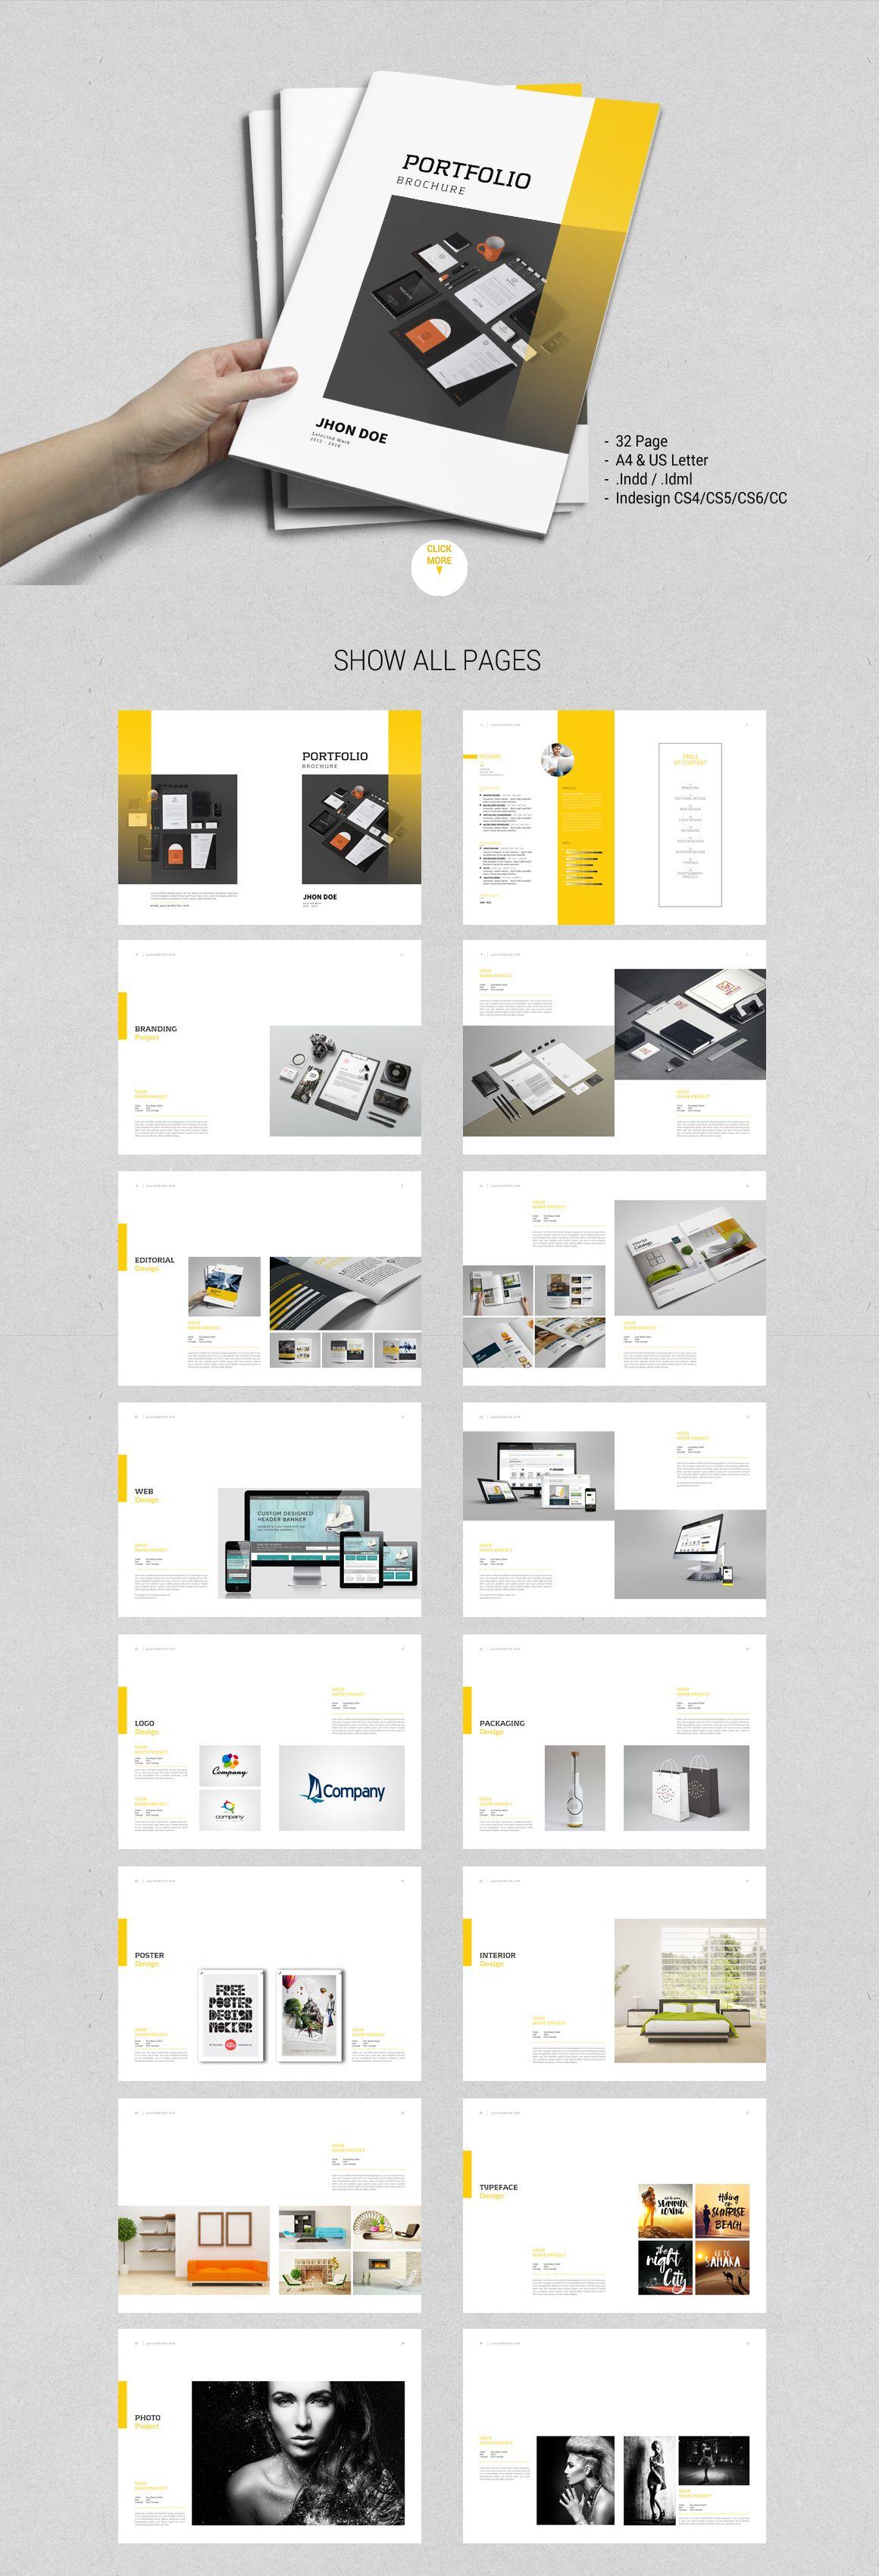 Bundle - Graphic Design Portfolio by tujuhbenua on @creativemarket ...